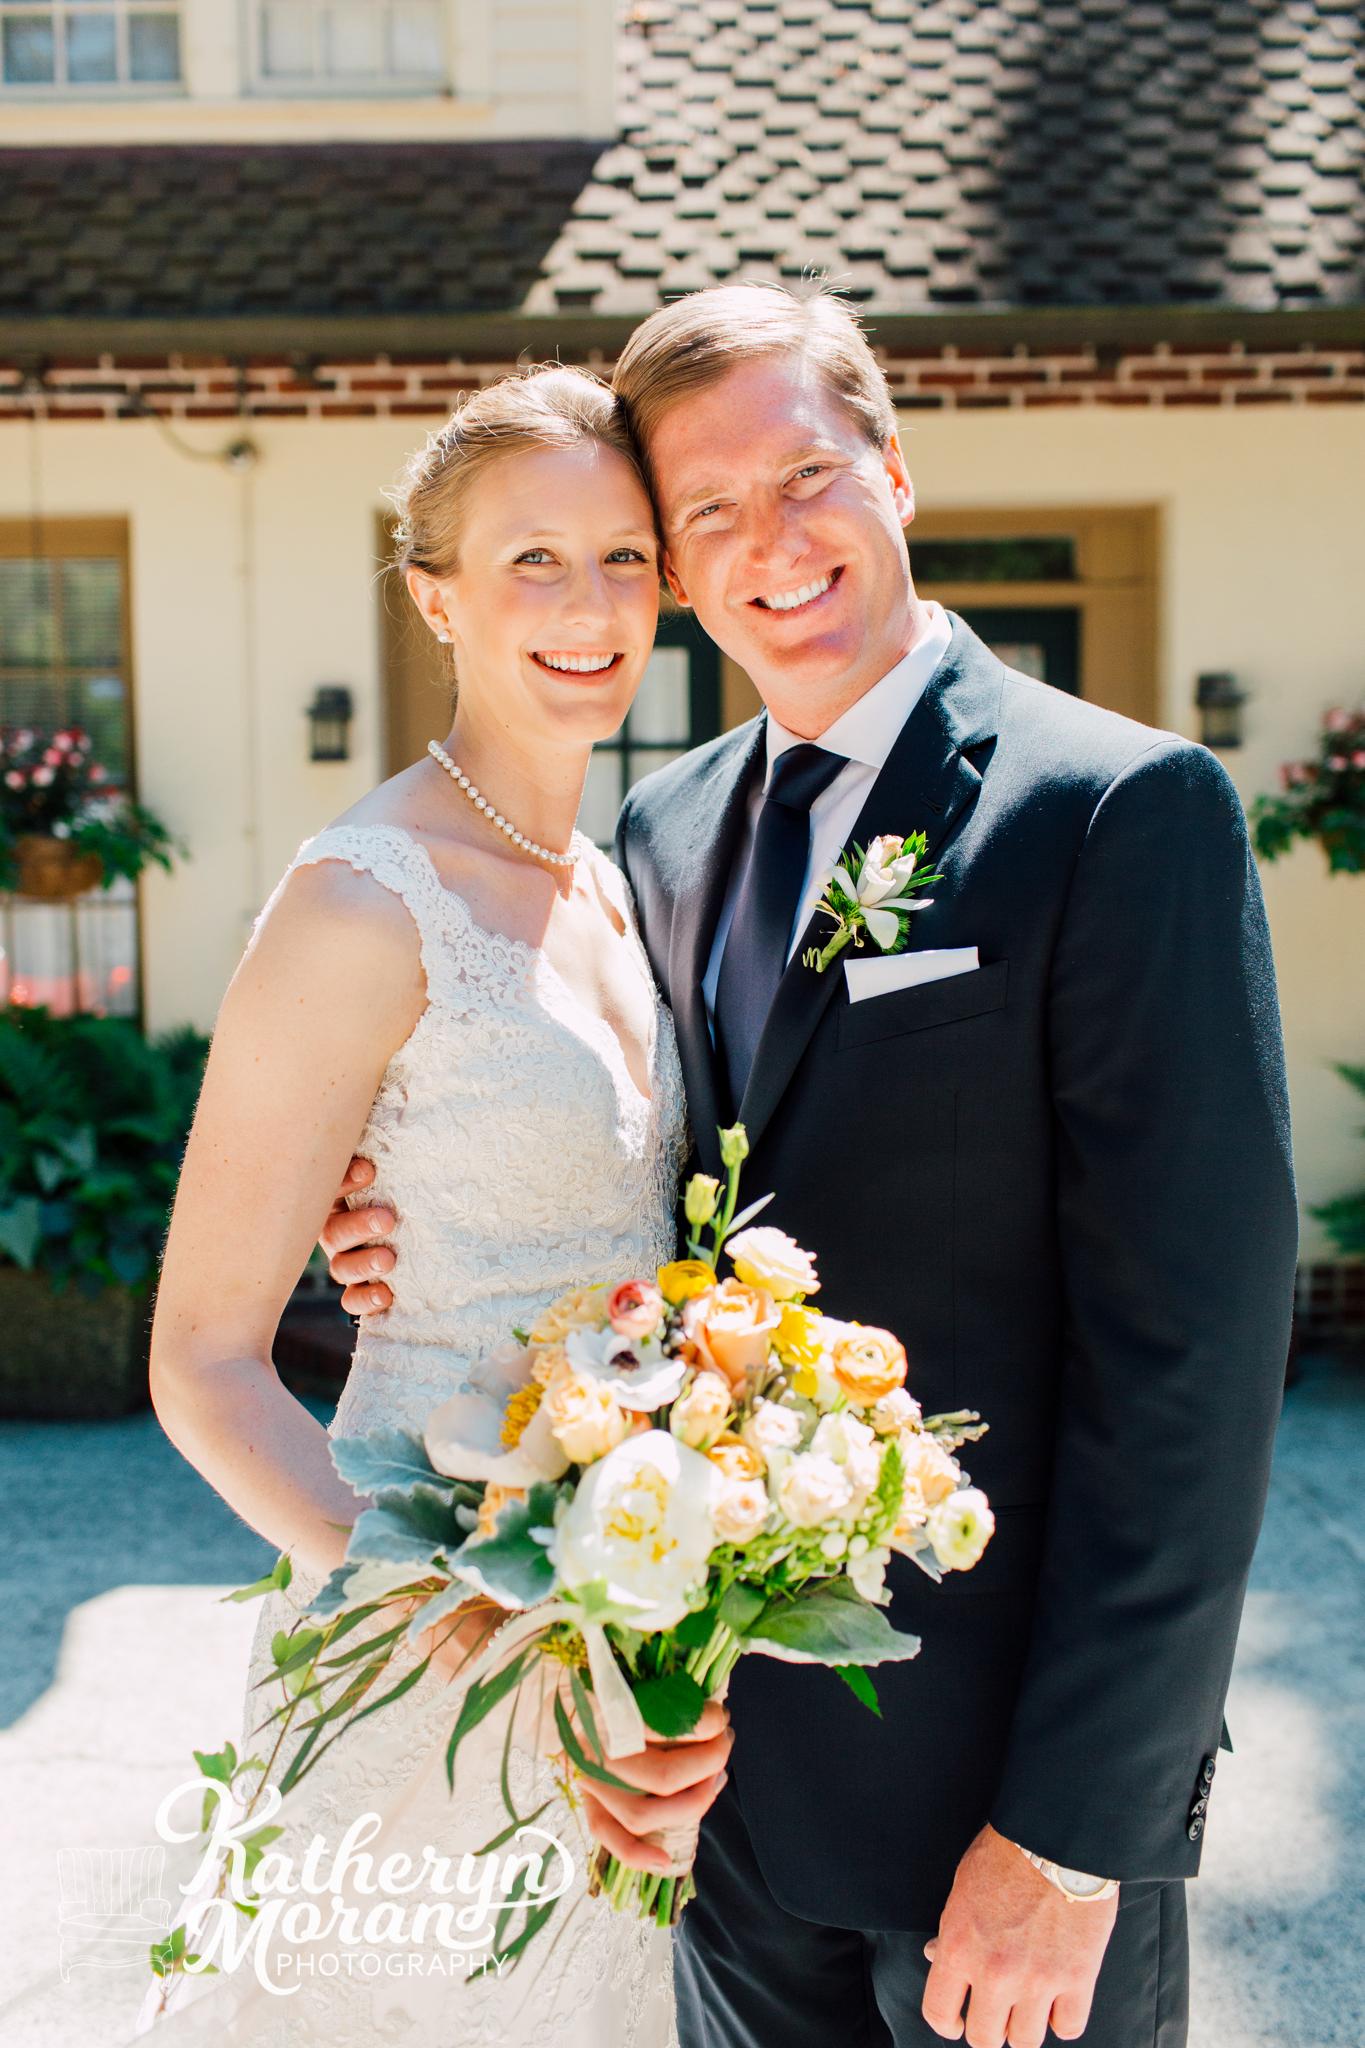 bellingham-wedding-photographer-lairmont-manor-katheryn-moran-6.jpg